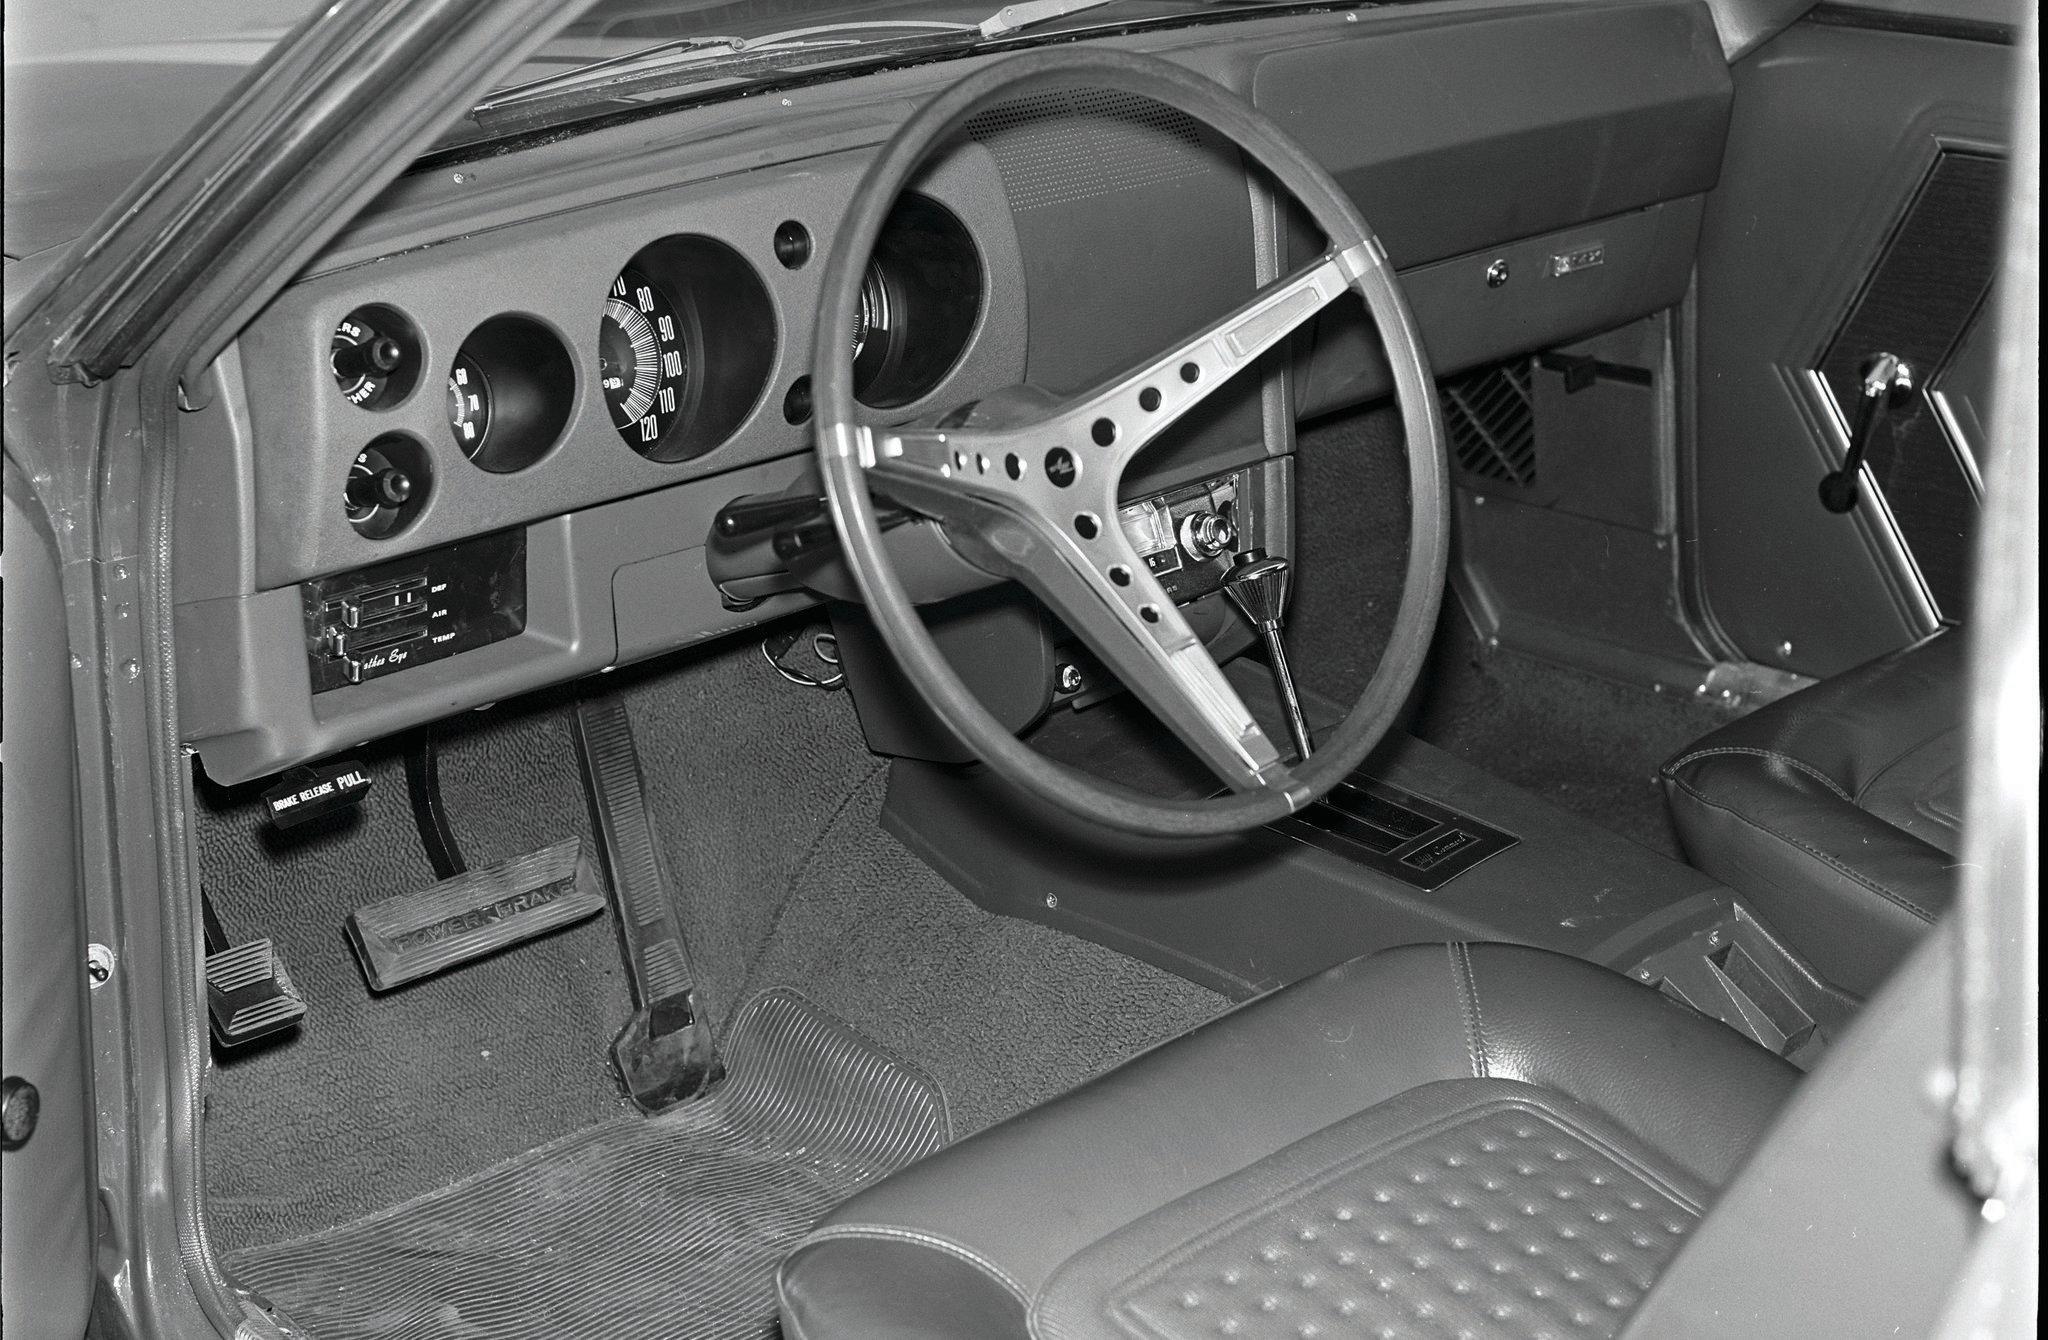 1968 amx wiring diagram [ 2048 x 1340 Pixel ]